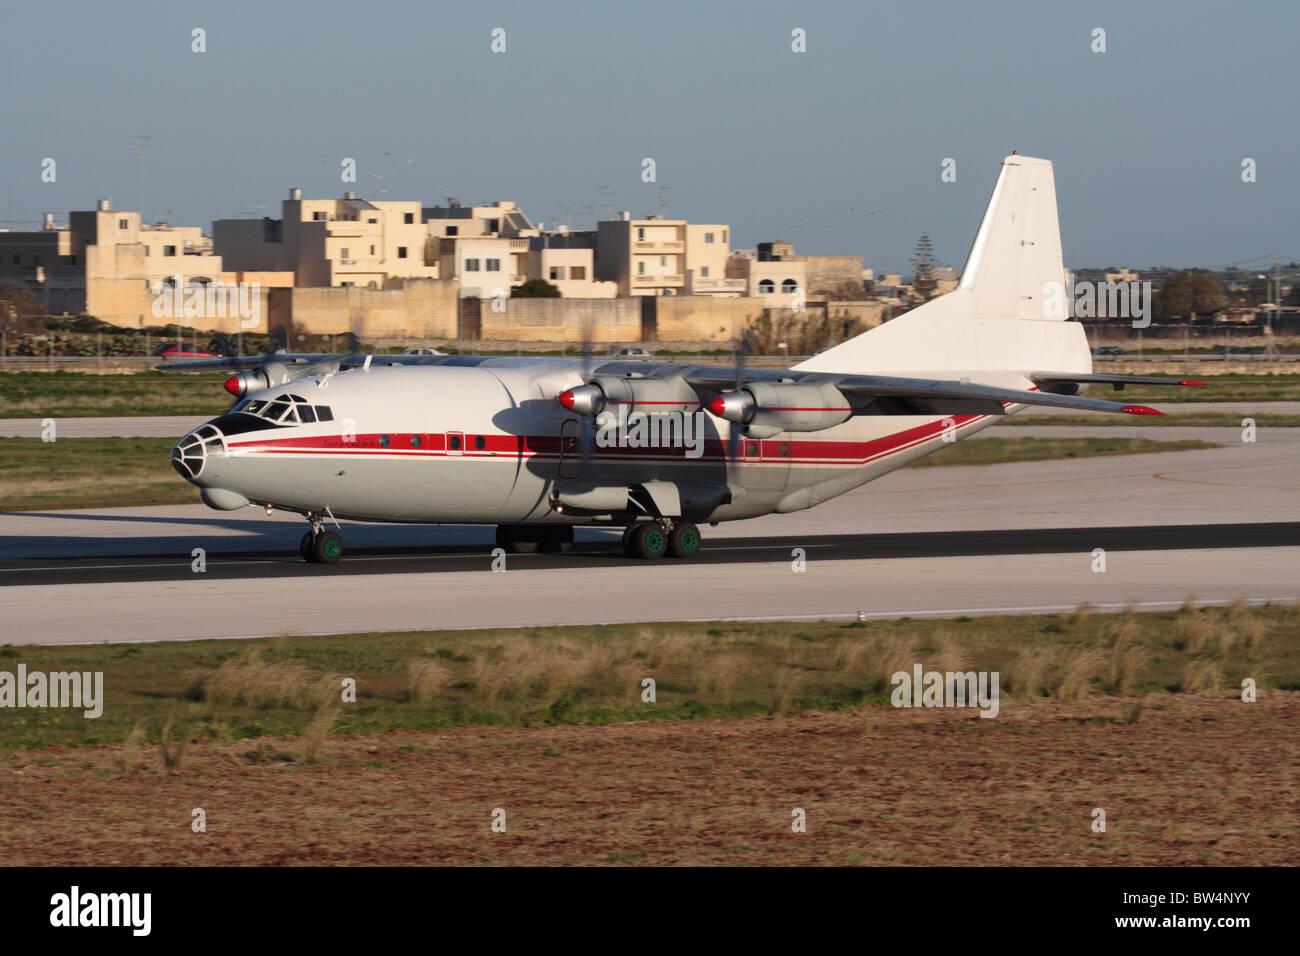 Meridian Aviation Antonov An-12 taking off - Stock Image